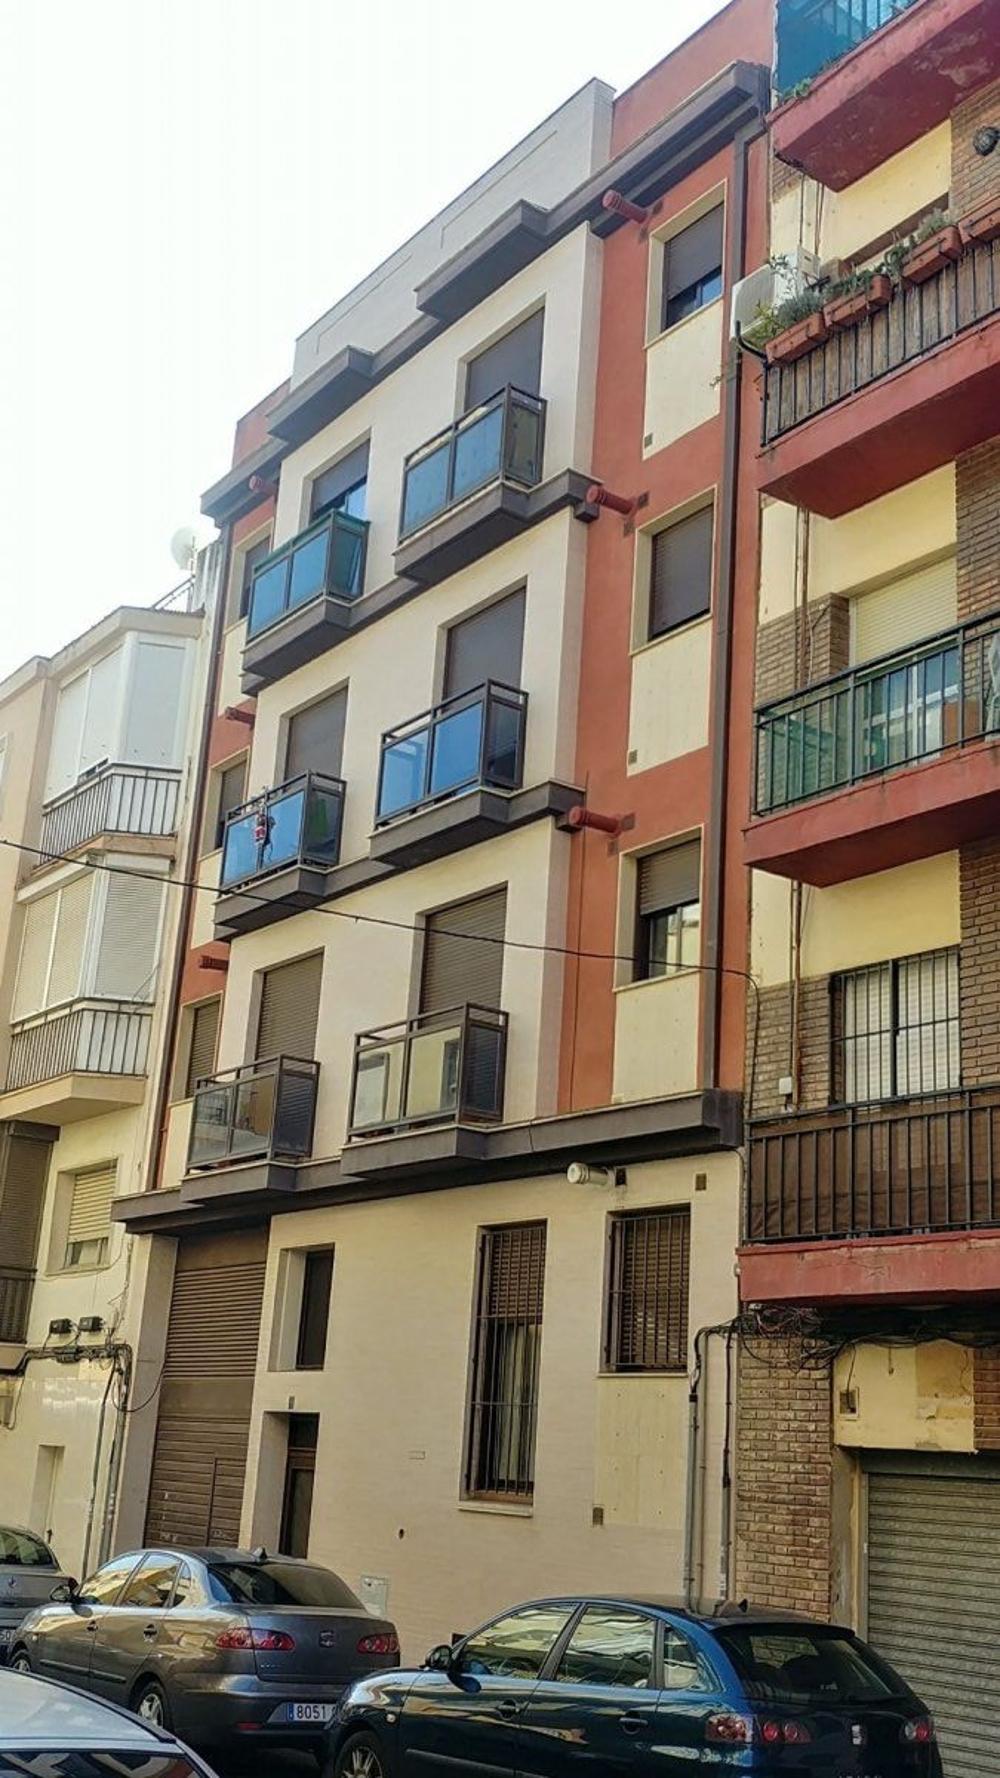 isla chica huelva appartement photo 3845026